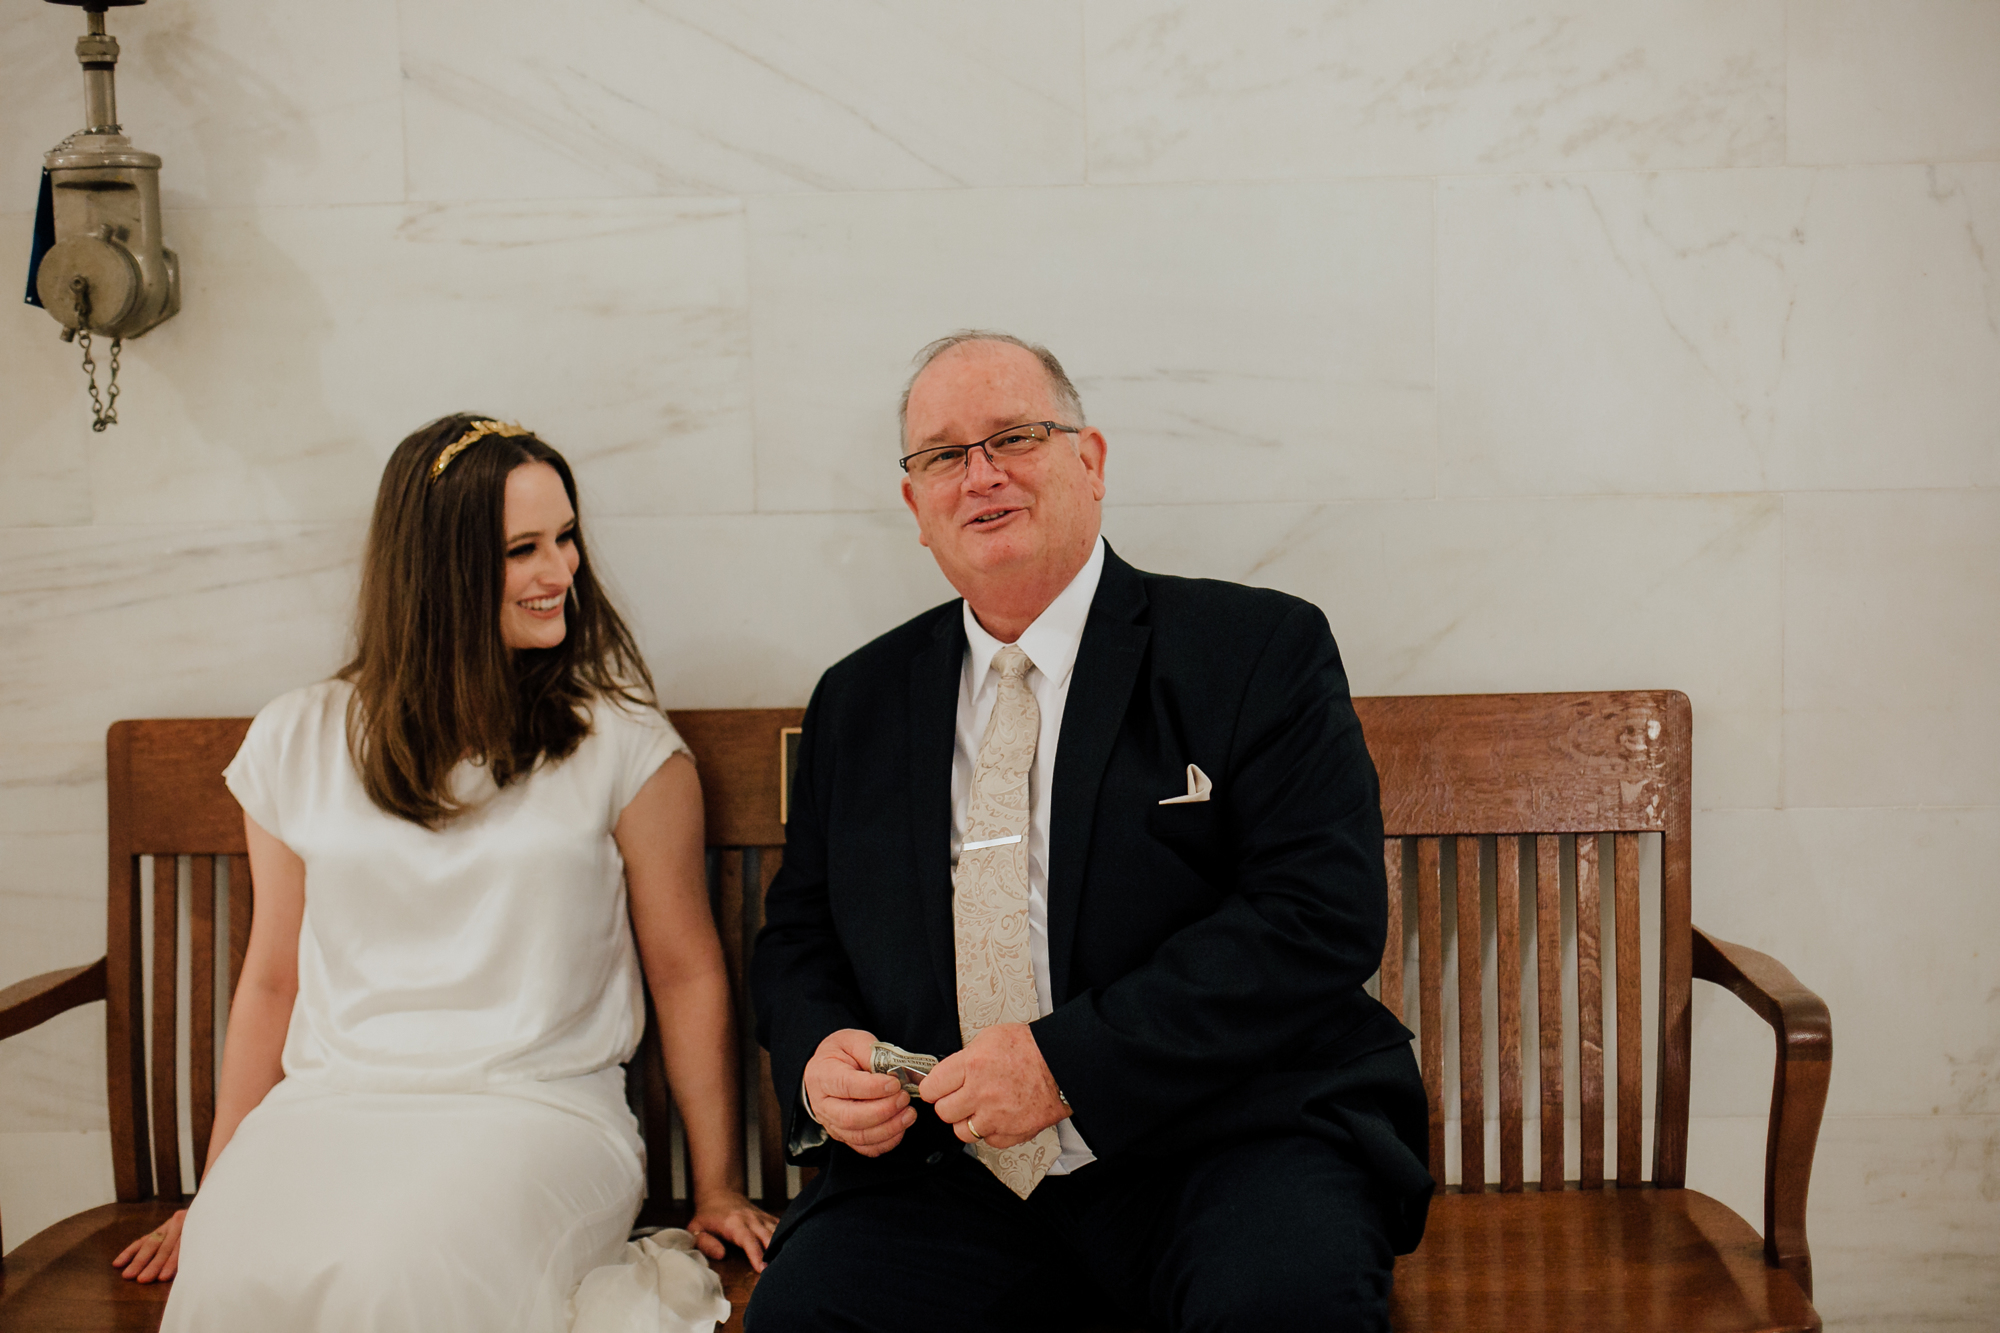 san-francisco-city-hall-wedding-marble-rye-photography-01173.JPG